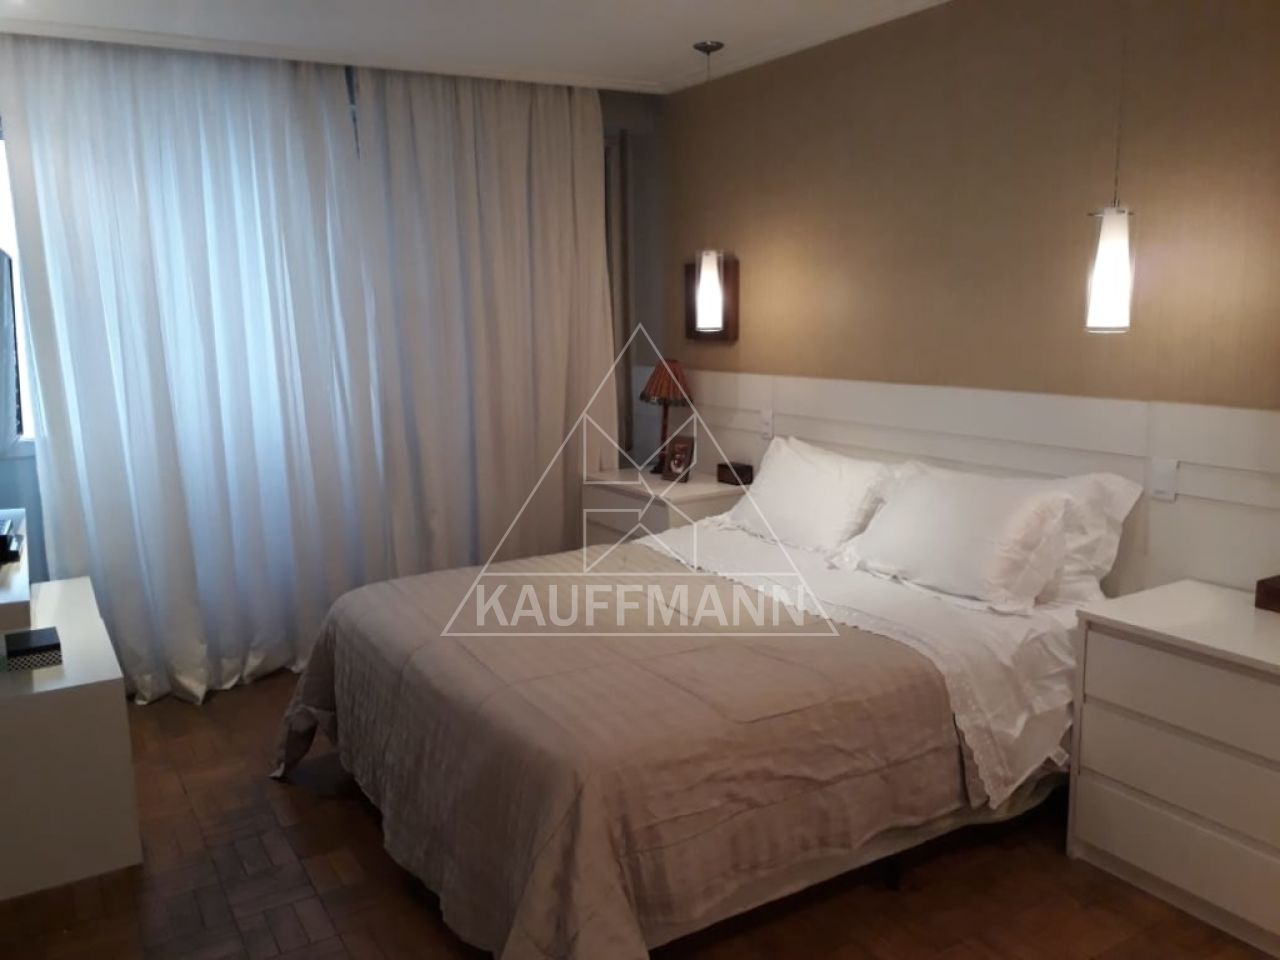 apartamento-venda-sao-paulo-jardim-paulista-3dormitorios-3suites-1vaga-174m2-Foto32